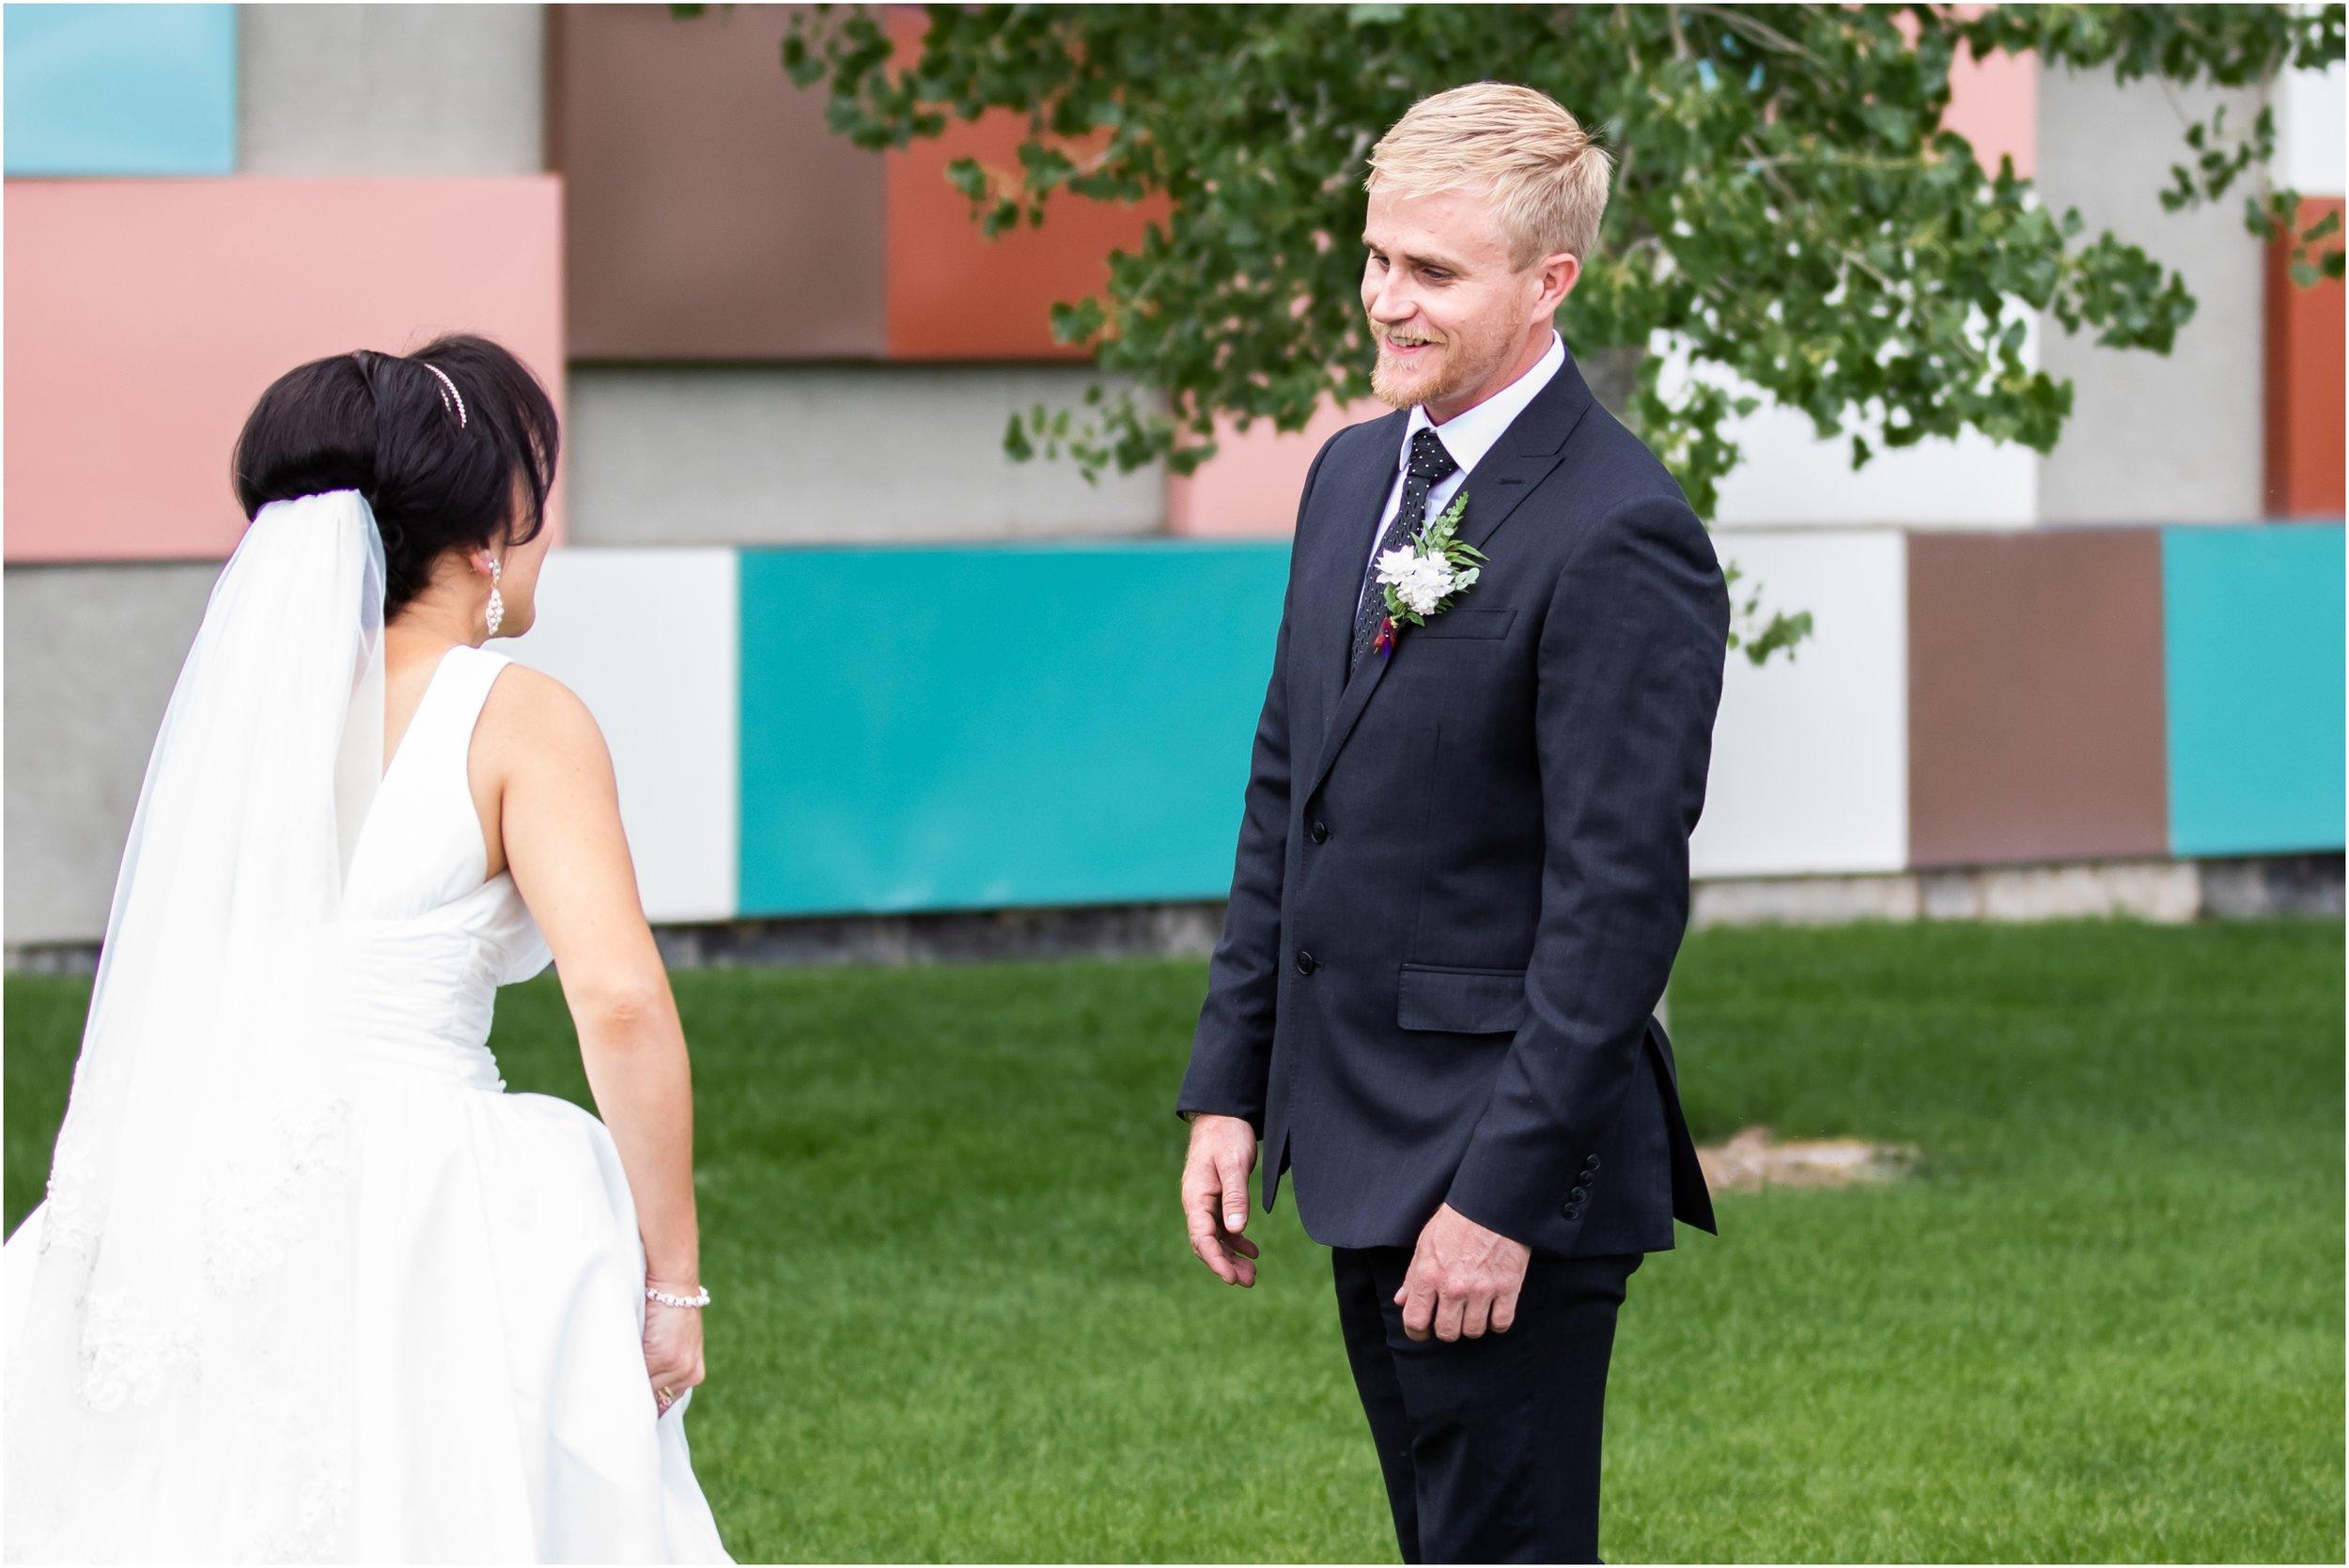 grand junction wedding photographer 11.jpg